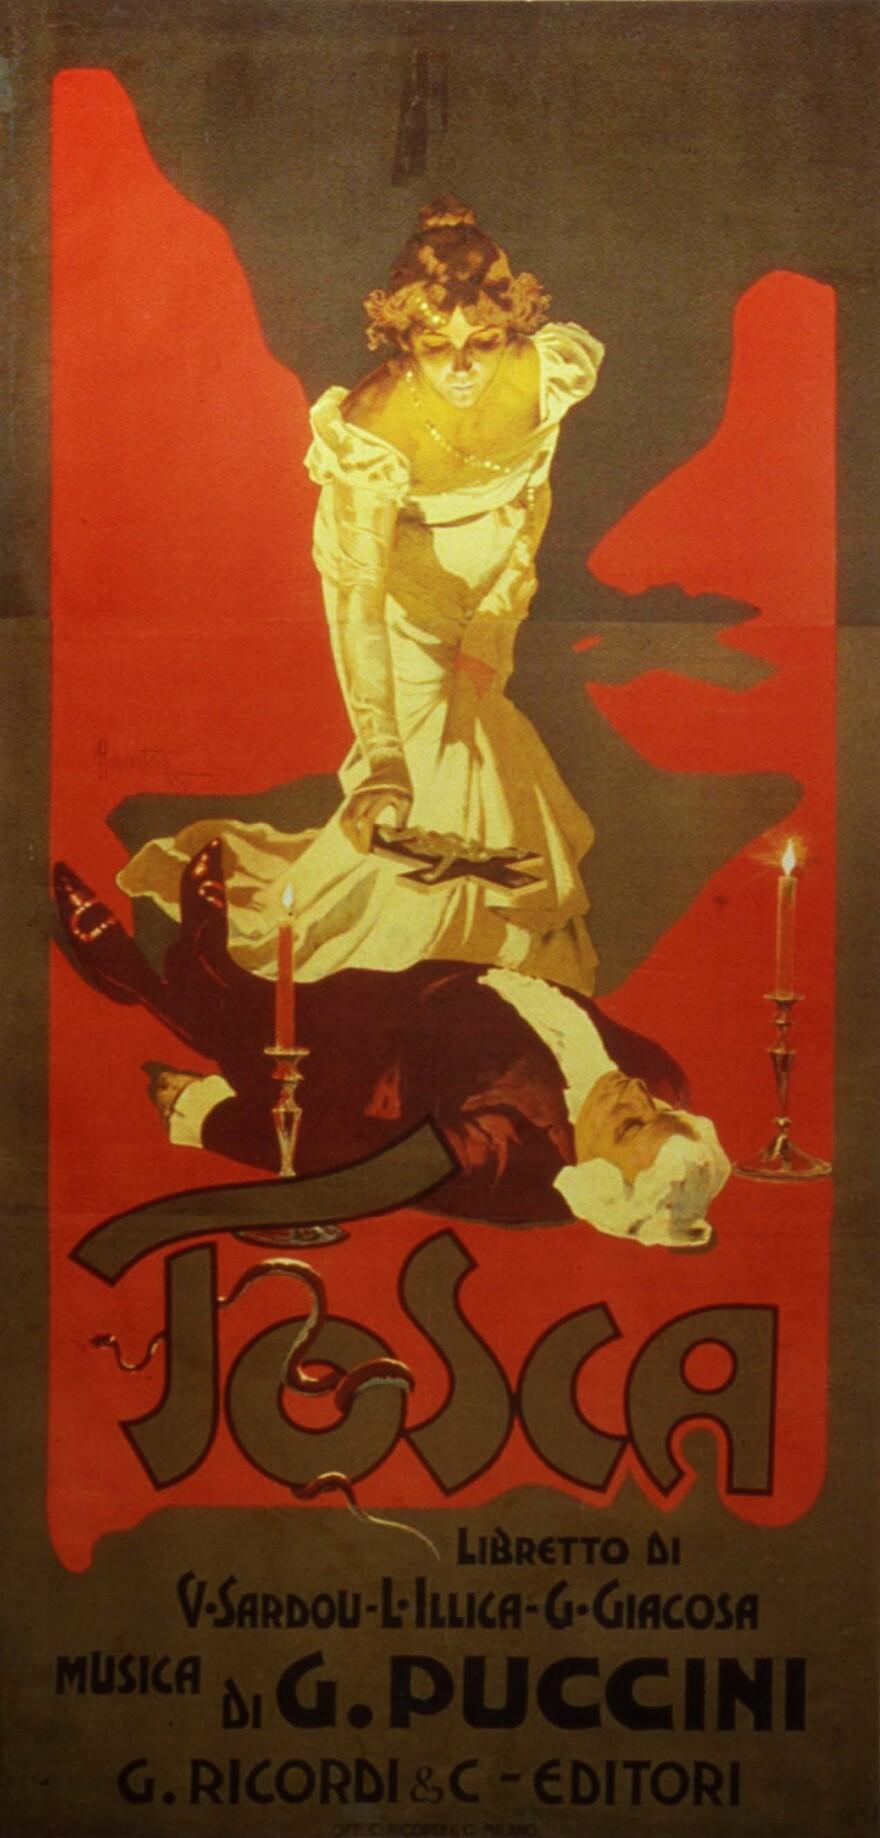 tosca__1899_.jpg